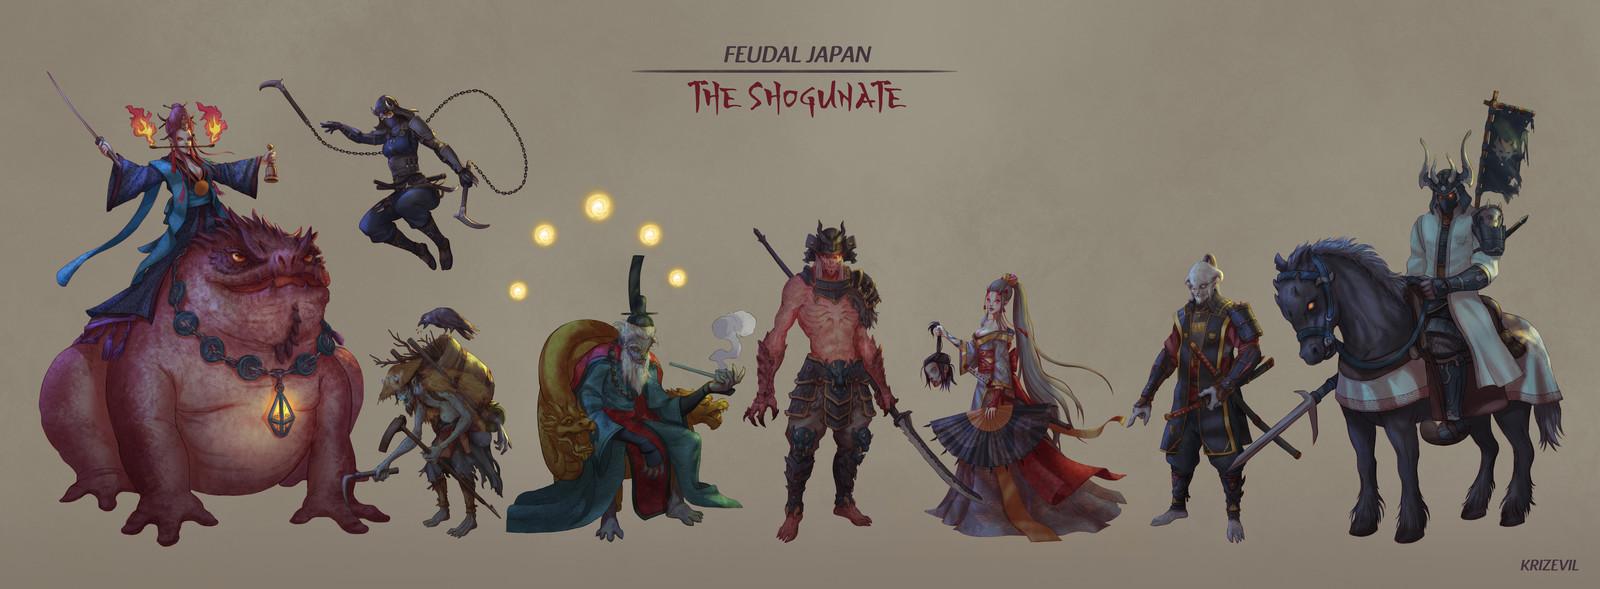 Feudal Japan: The Shogunate